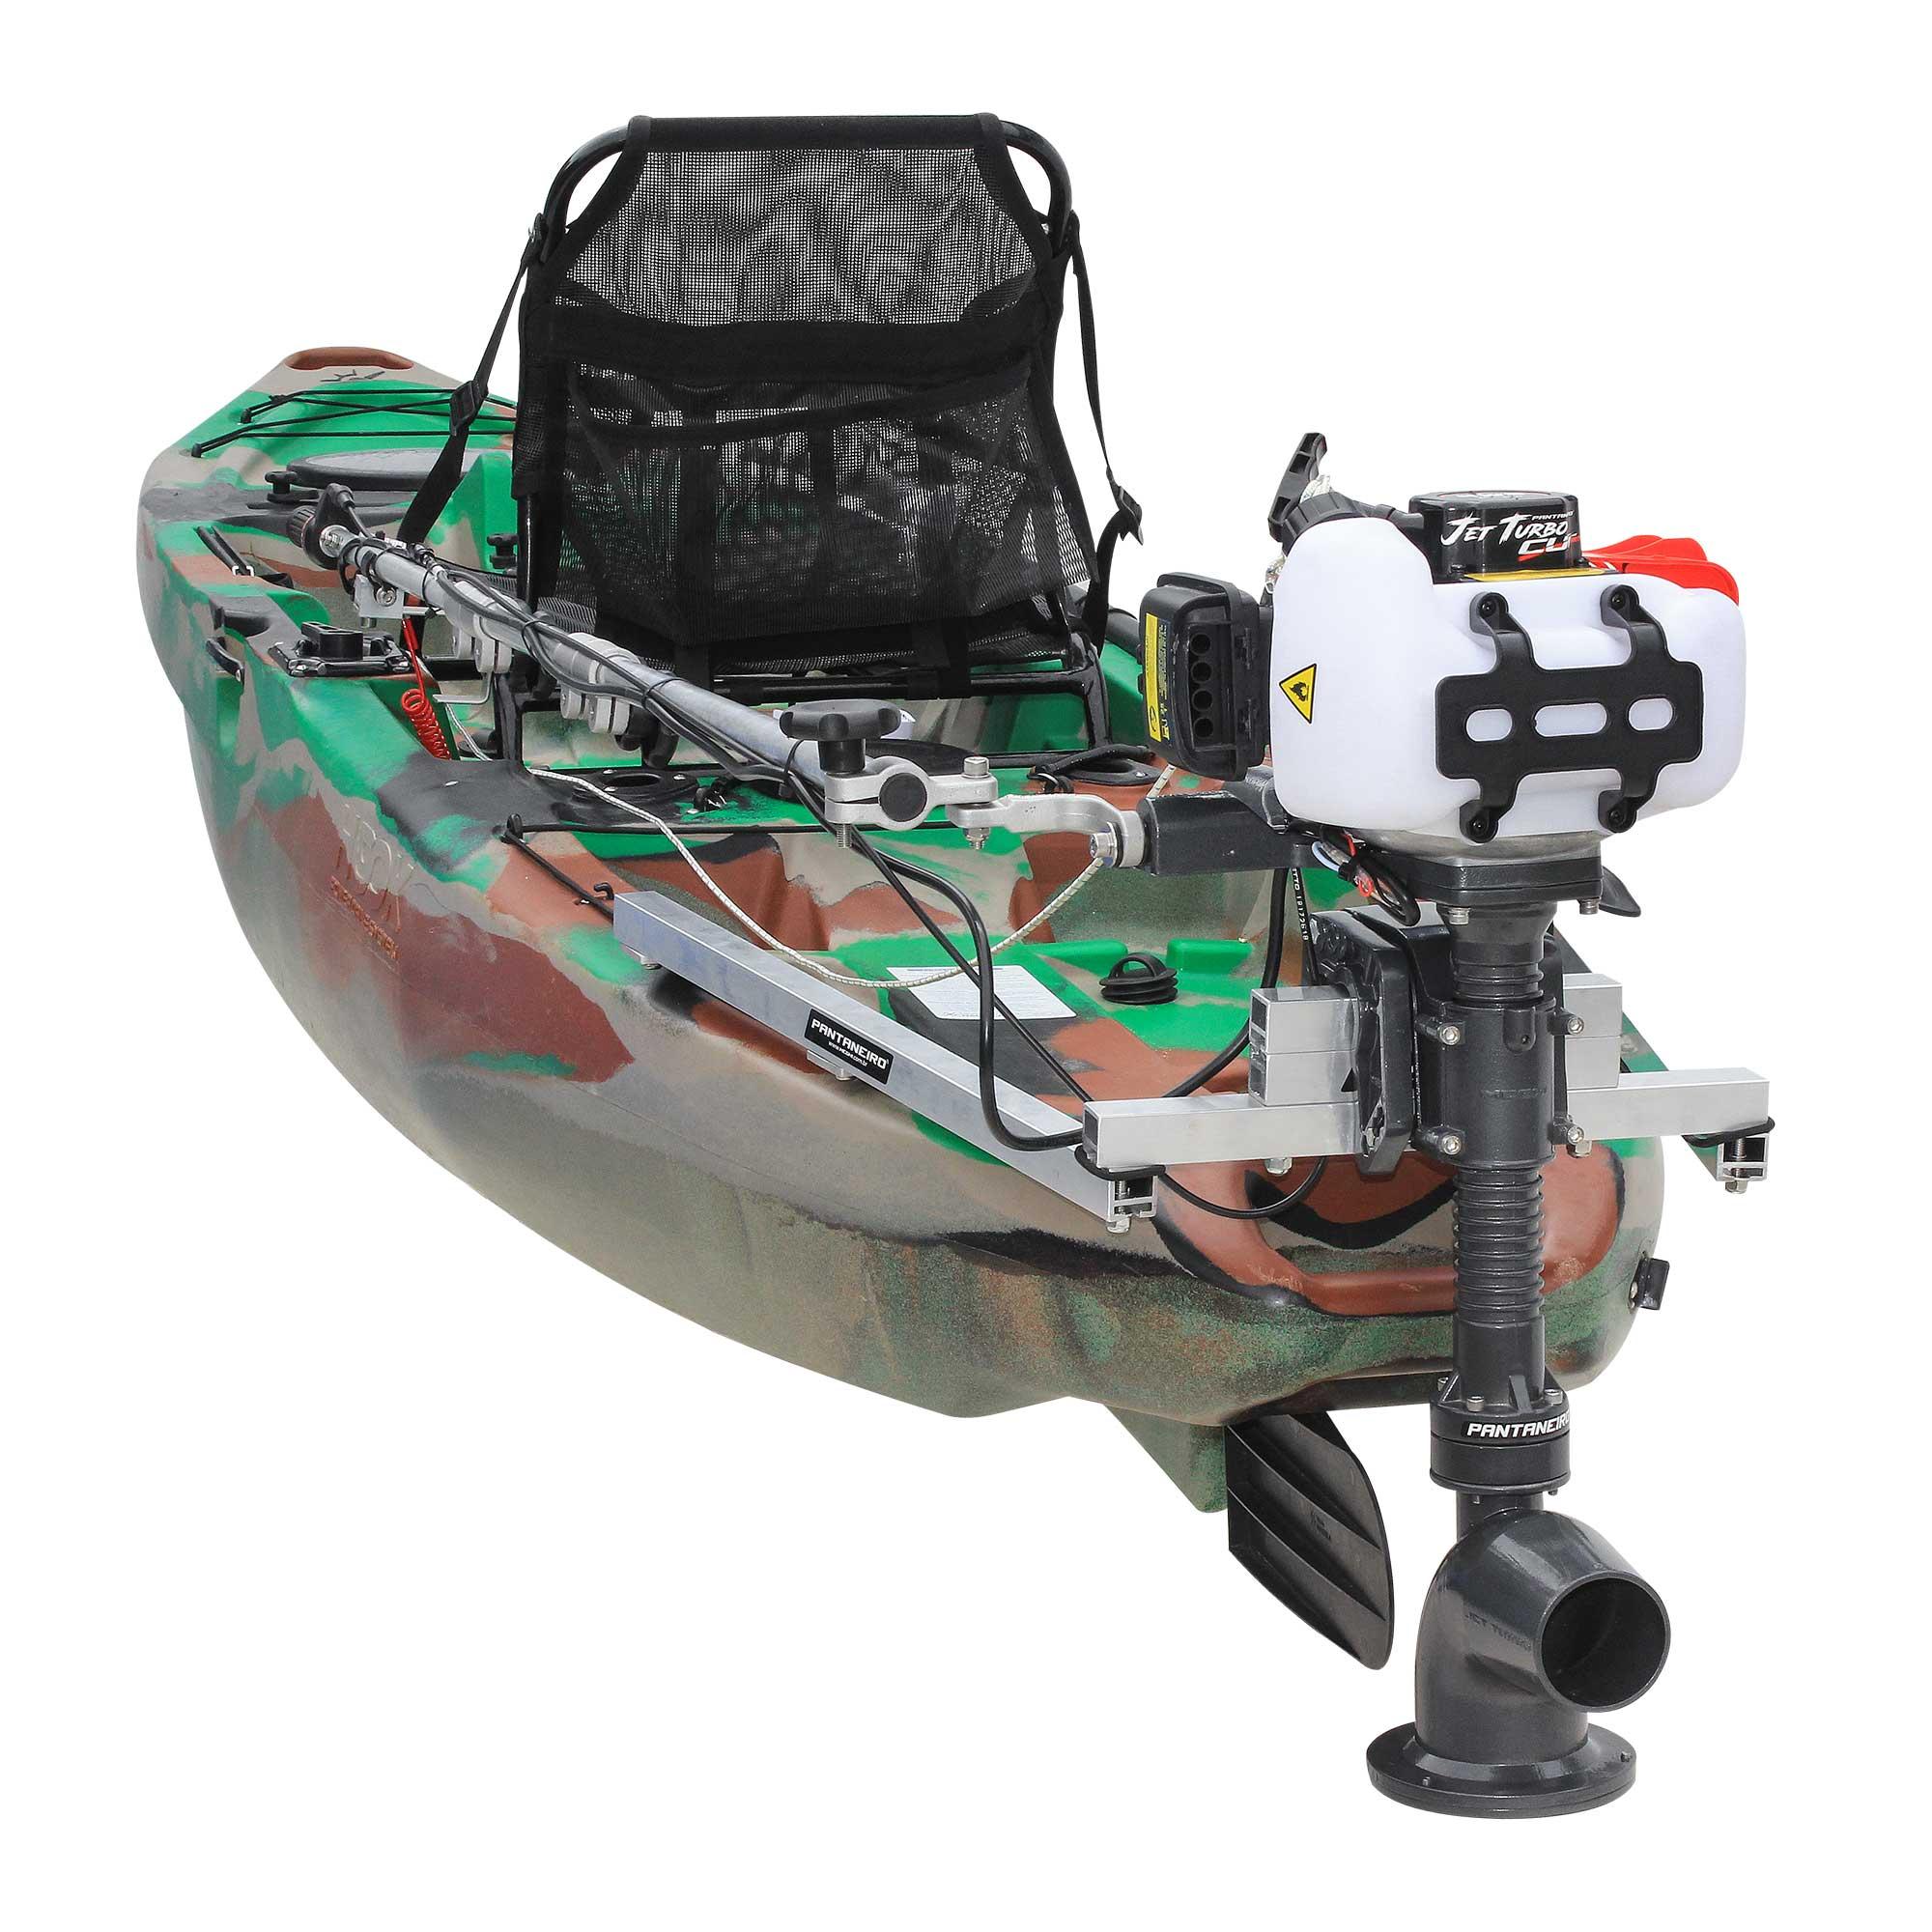 Kit Acelerador remoto para caiaques Leader / Hook